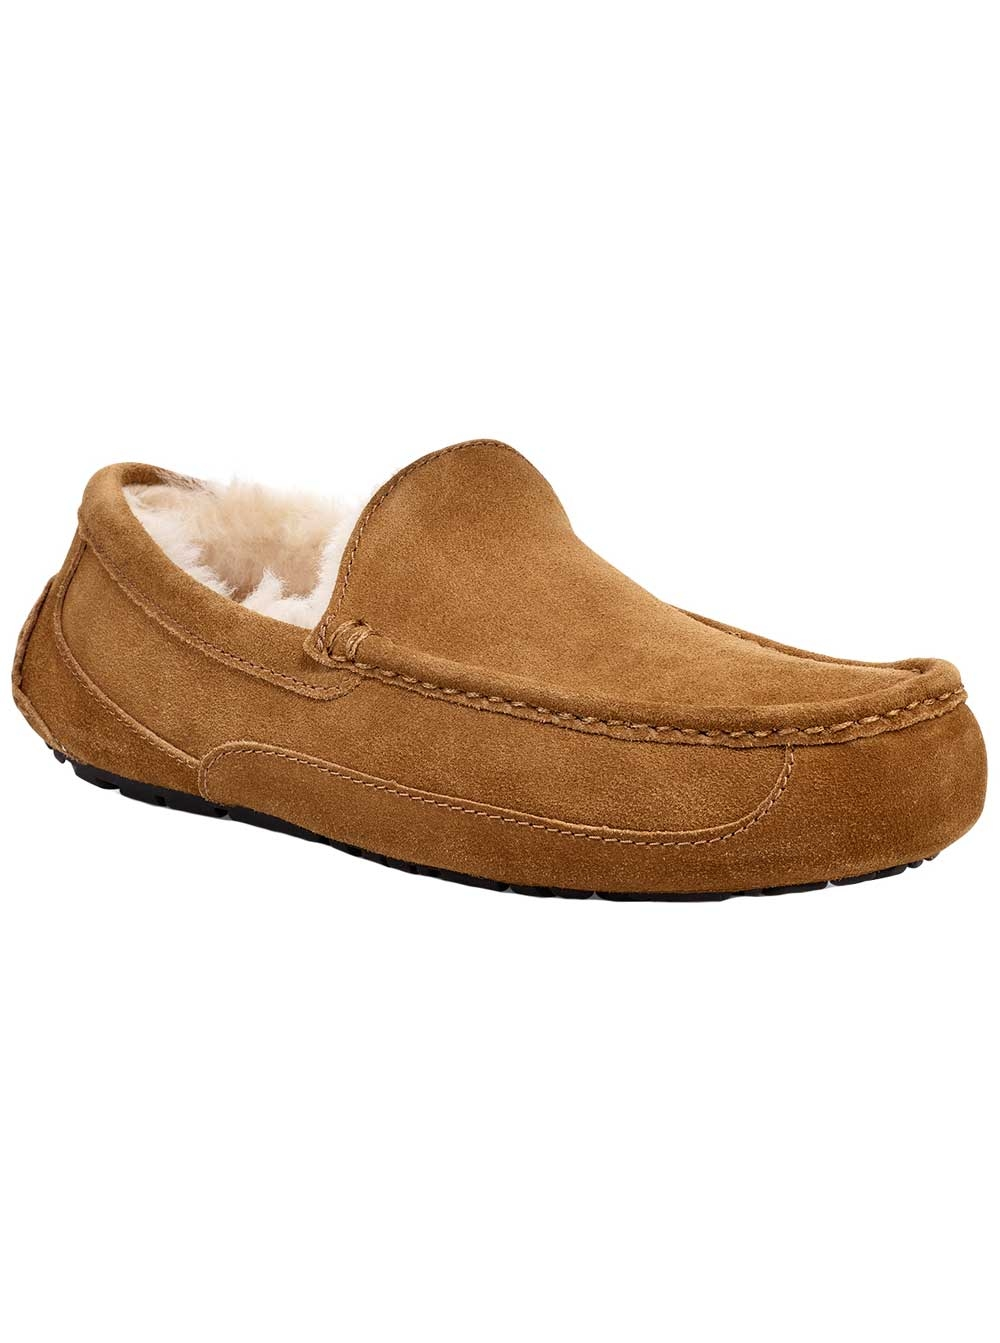 b85b115fe Ugg Australia Mens Ascot Suede Closed Toe Slip On Slippers